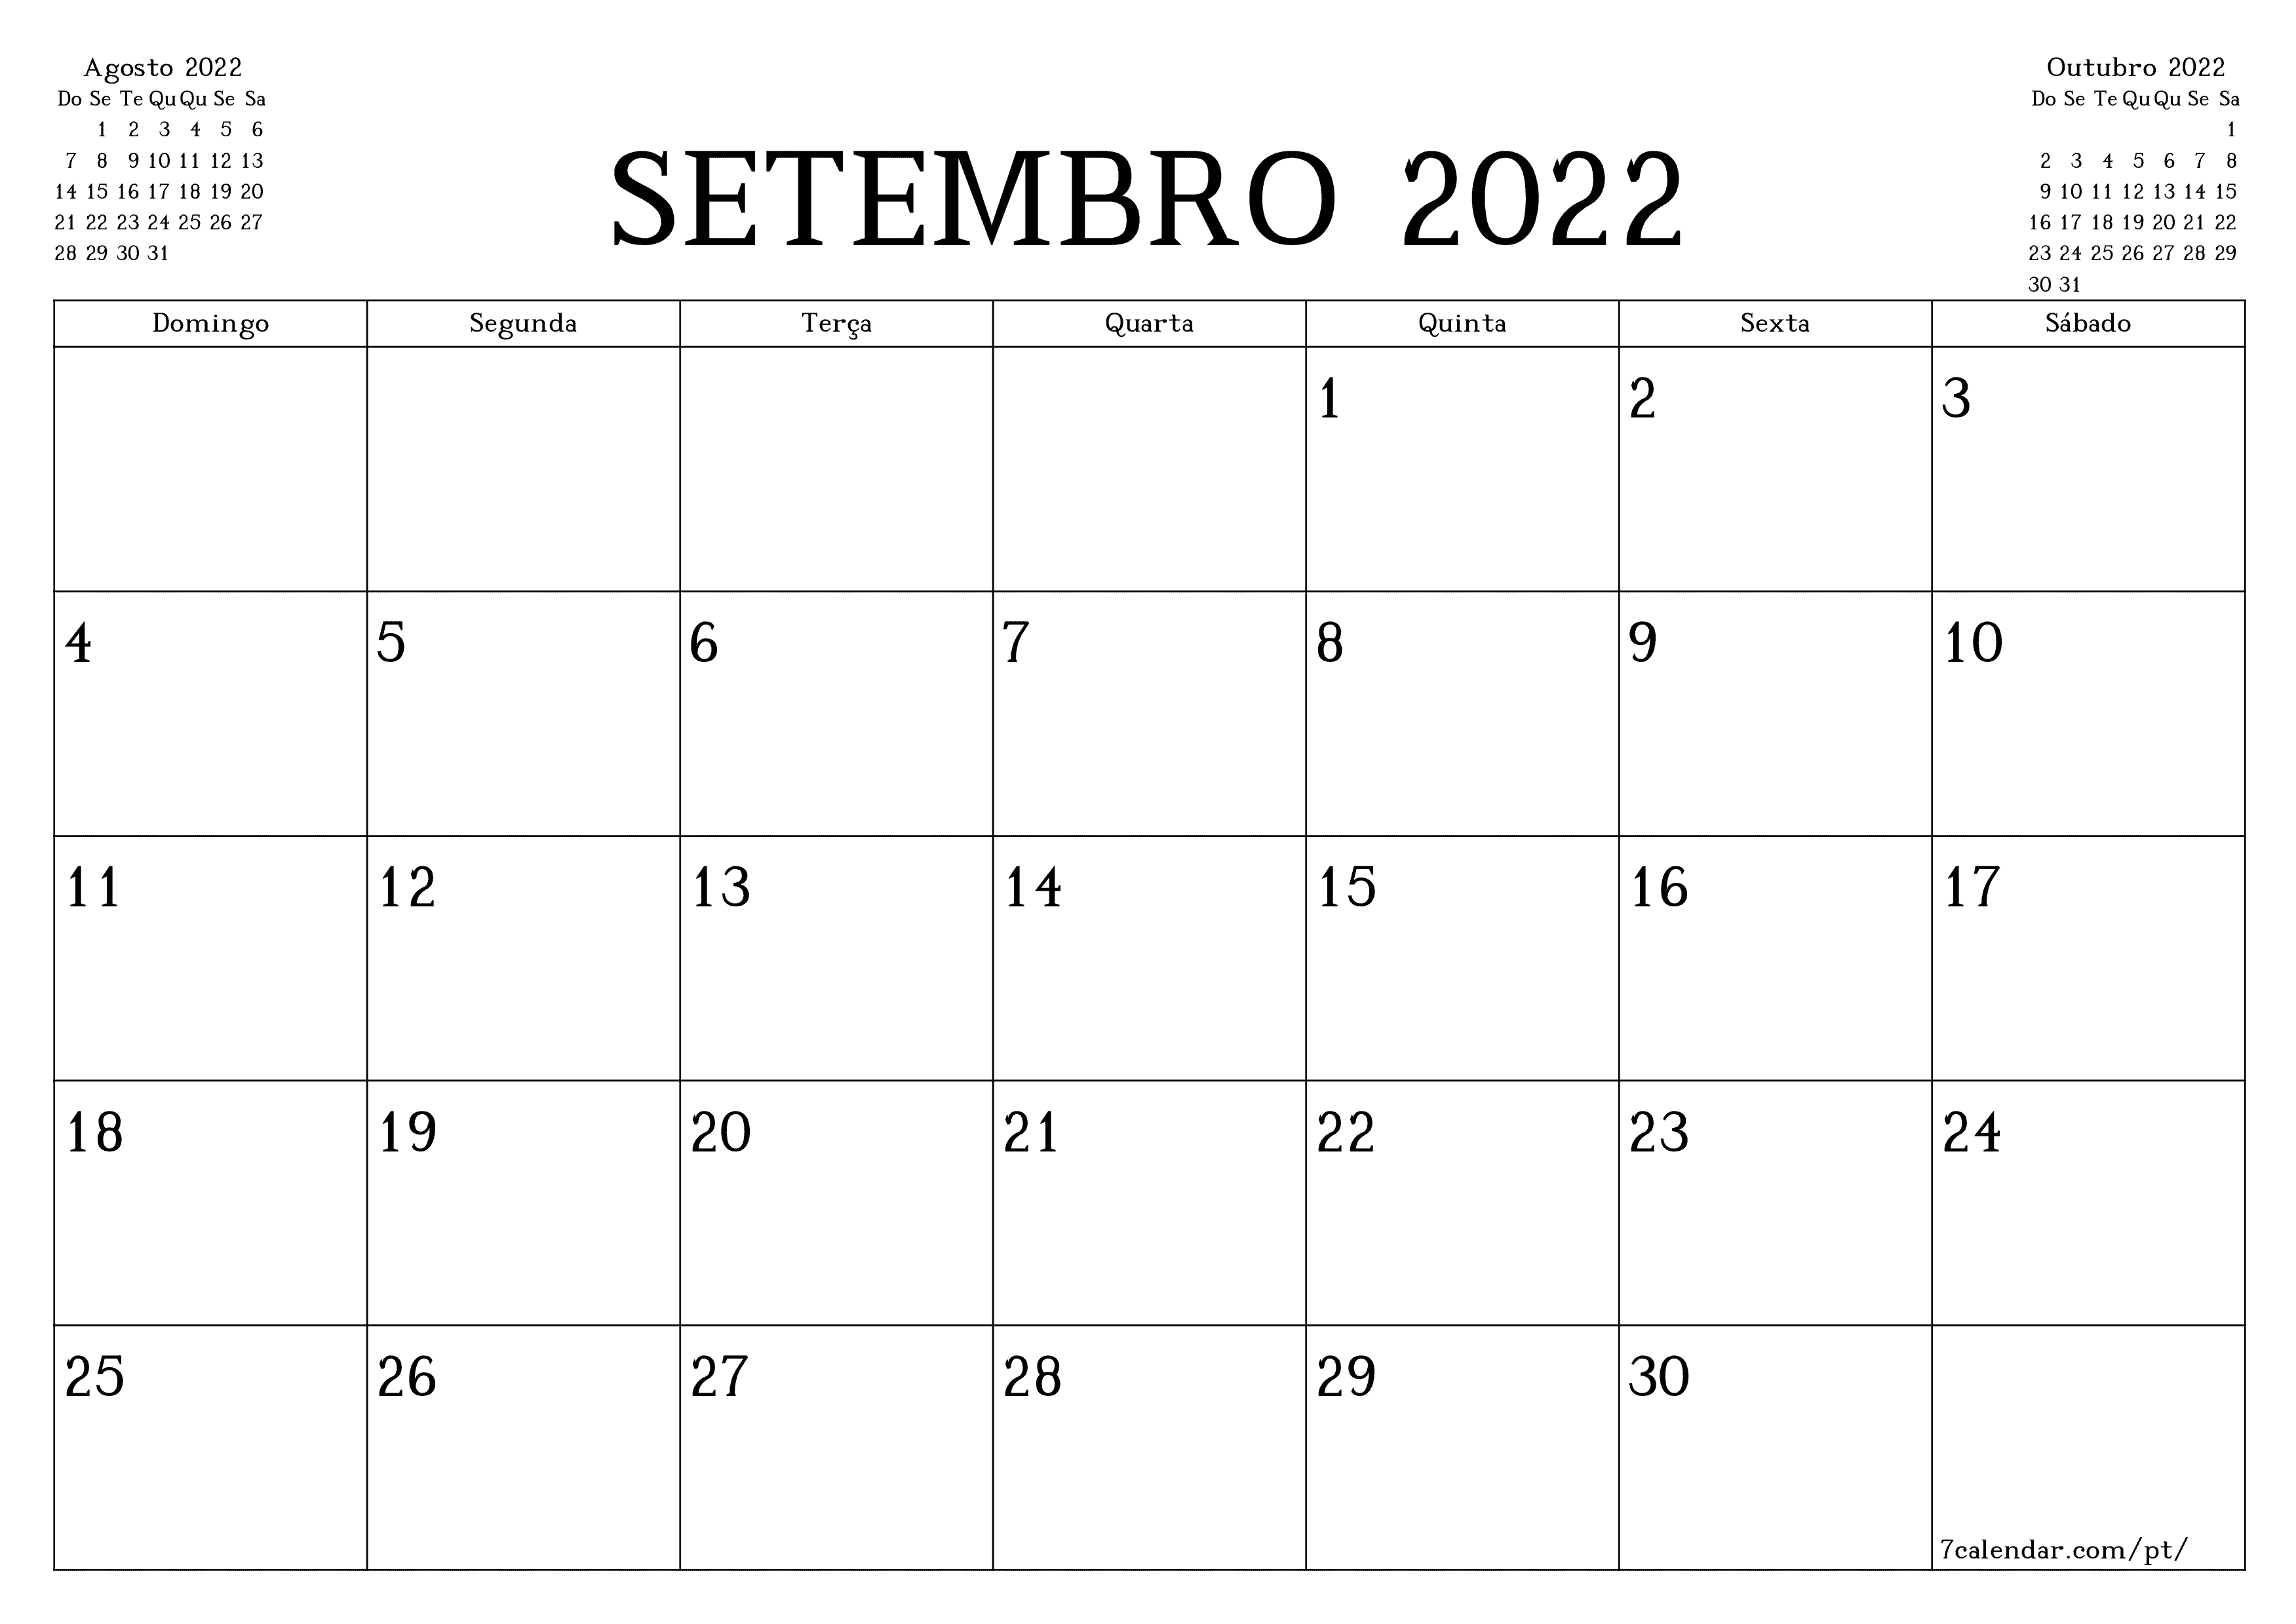 Calendarios E Planejadores Imprimiveis Para O Mes Setembro 2022 A4 A3 Para Pdf E Png 7calendar